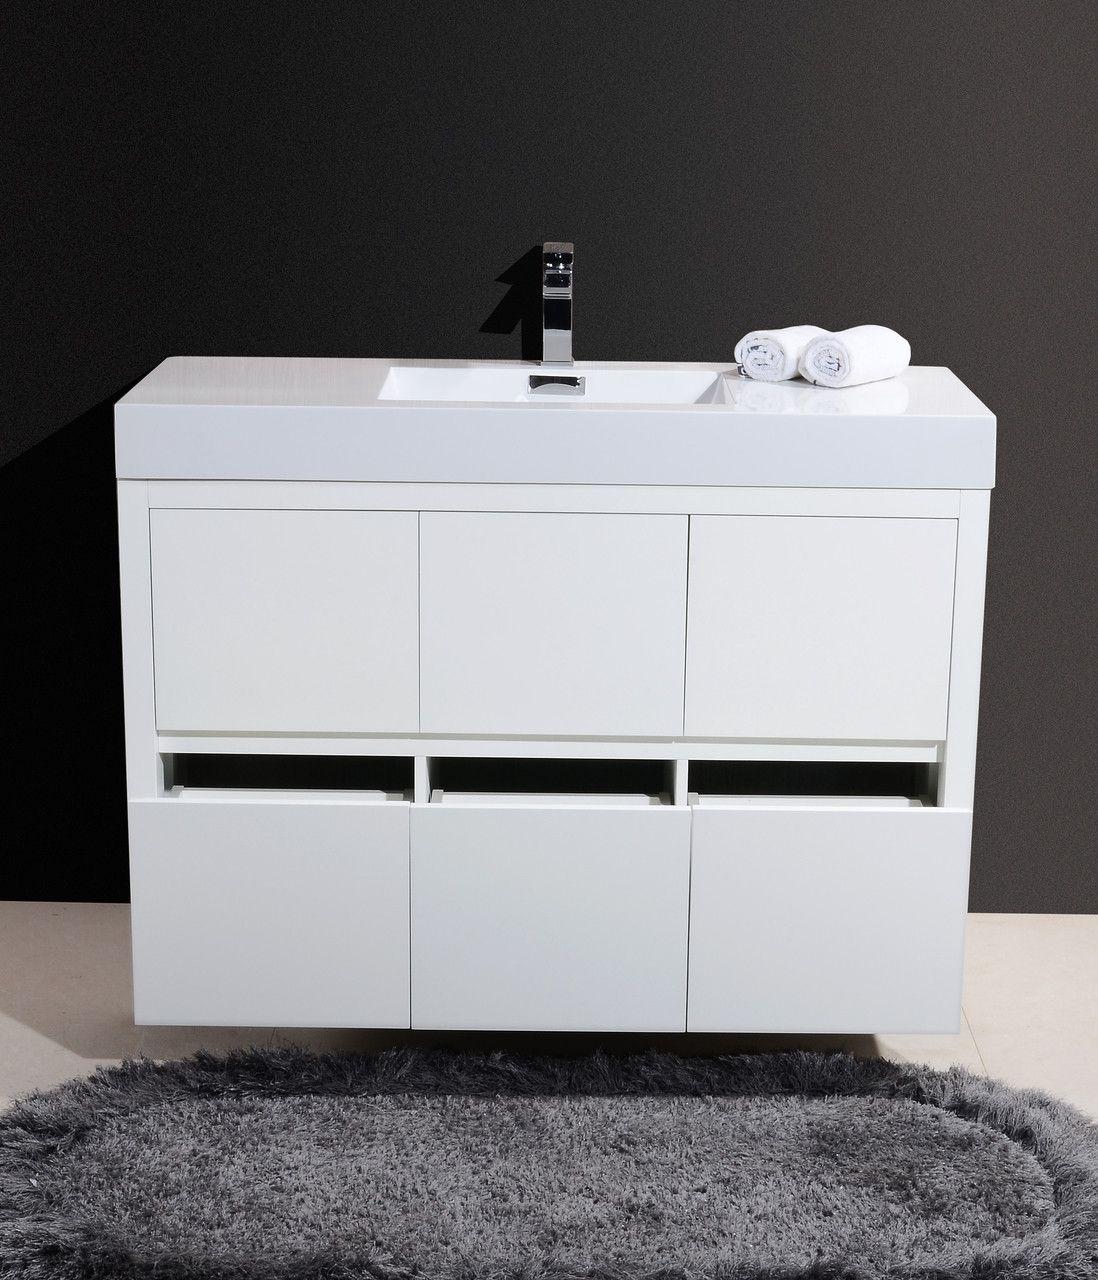 Inspirational 15 Inch Bathroom Cabinet